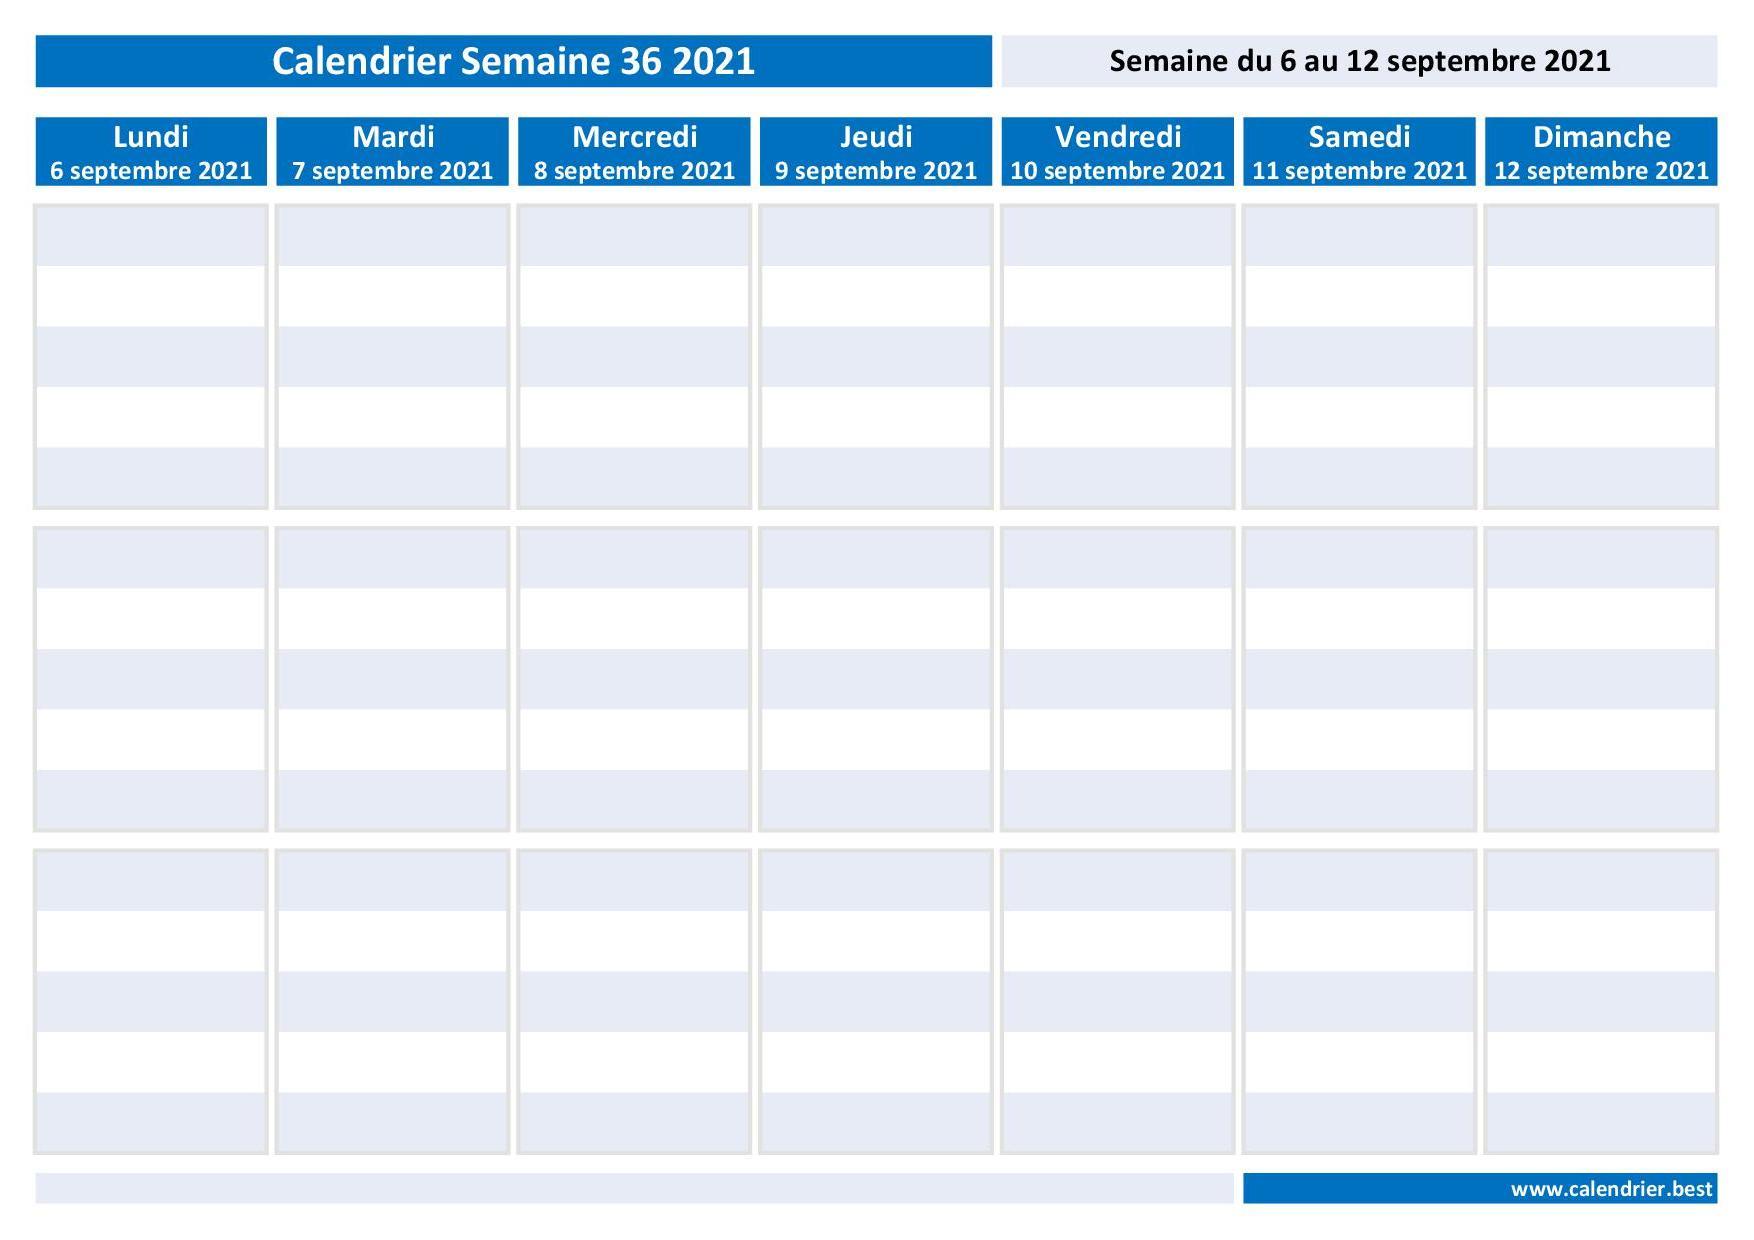 Semaine 36 2021 : dates, calendrier et planning  Calendrier.best